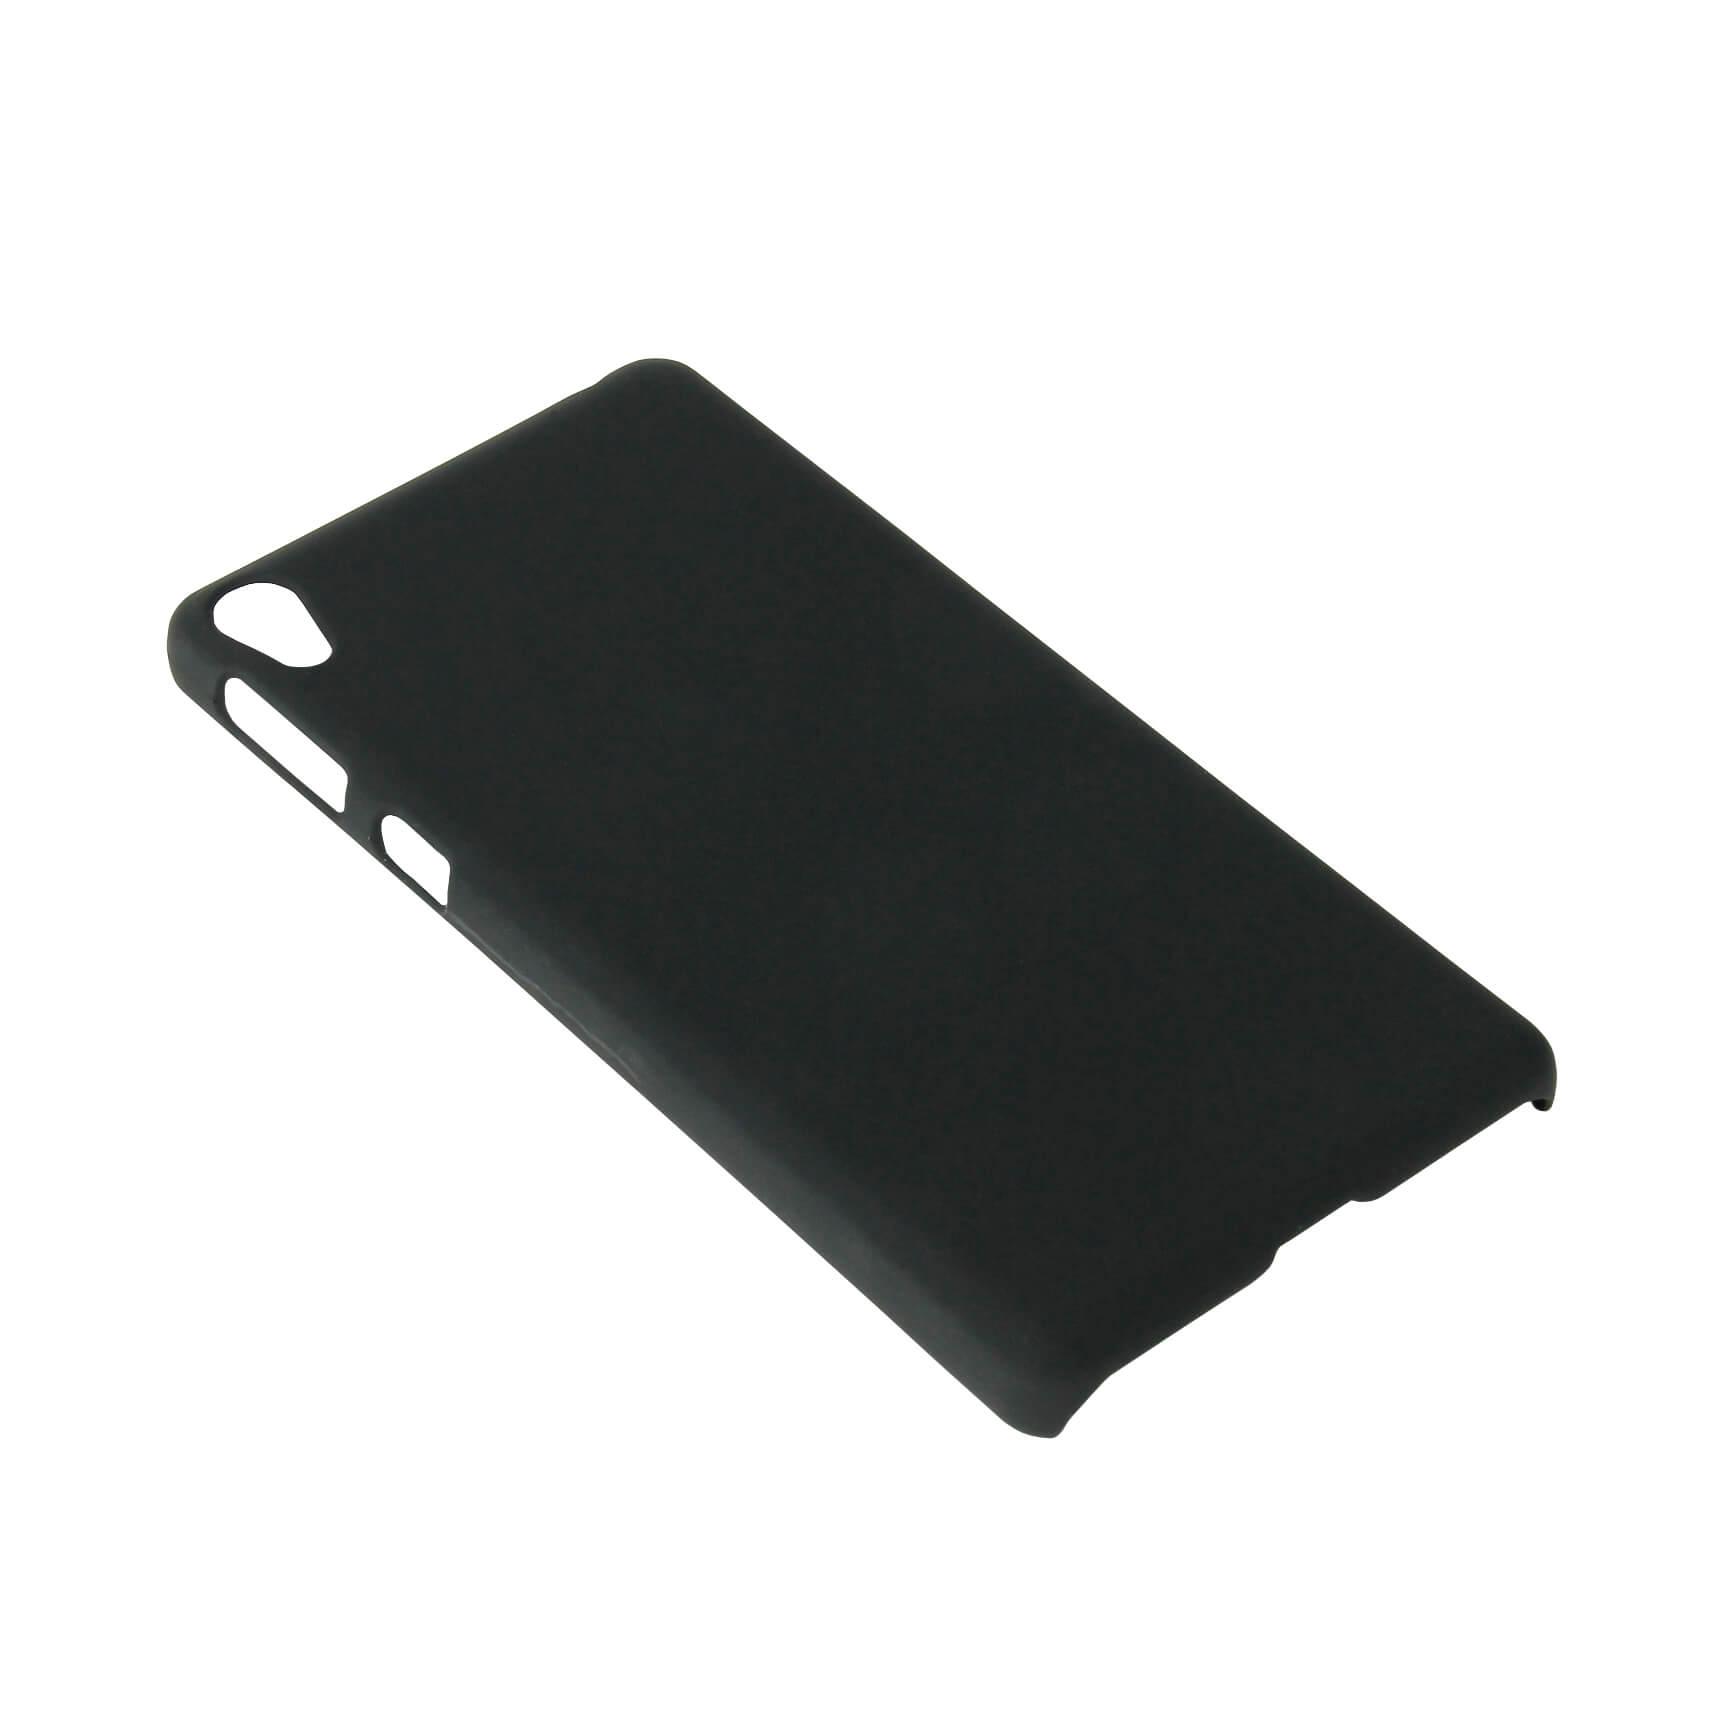 GEAR mobilskal till Sony Xperia E5 - Svart